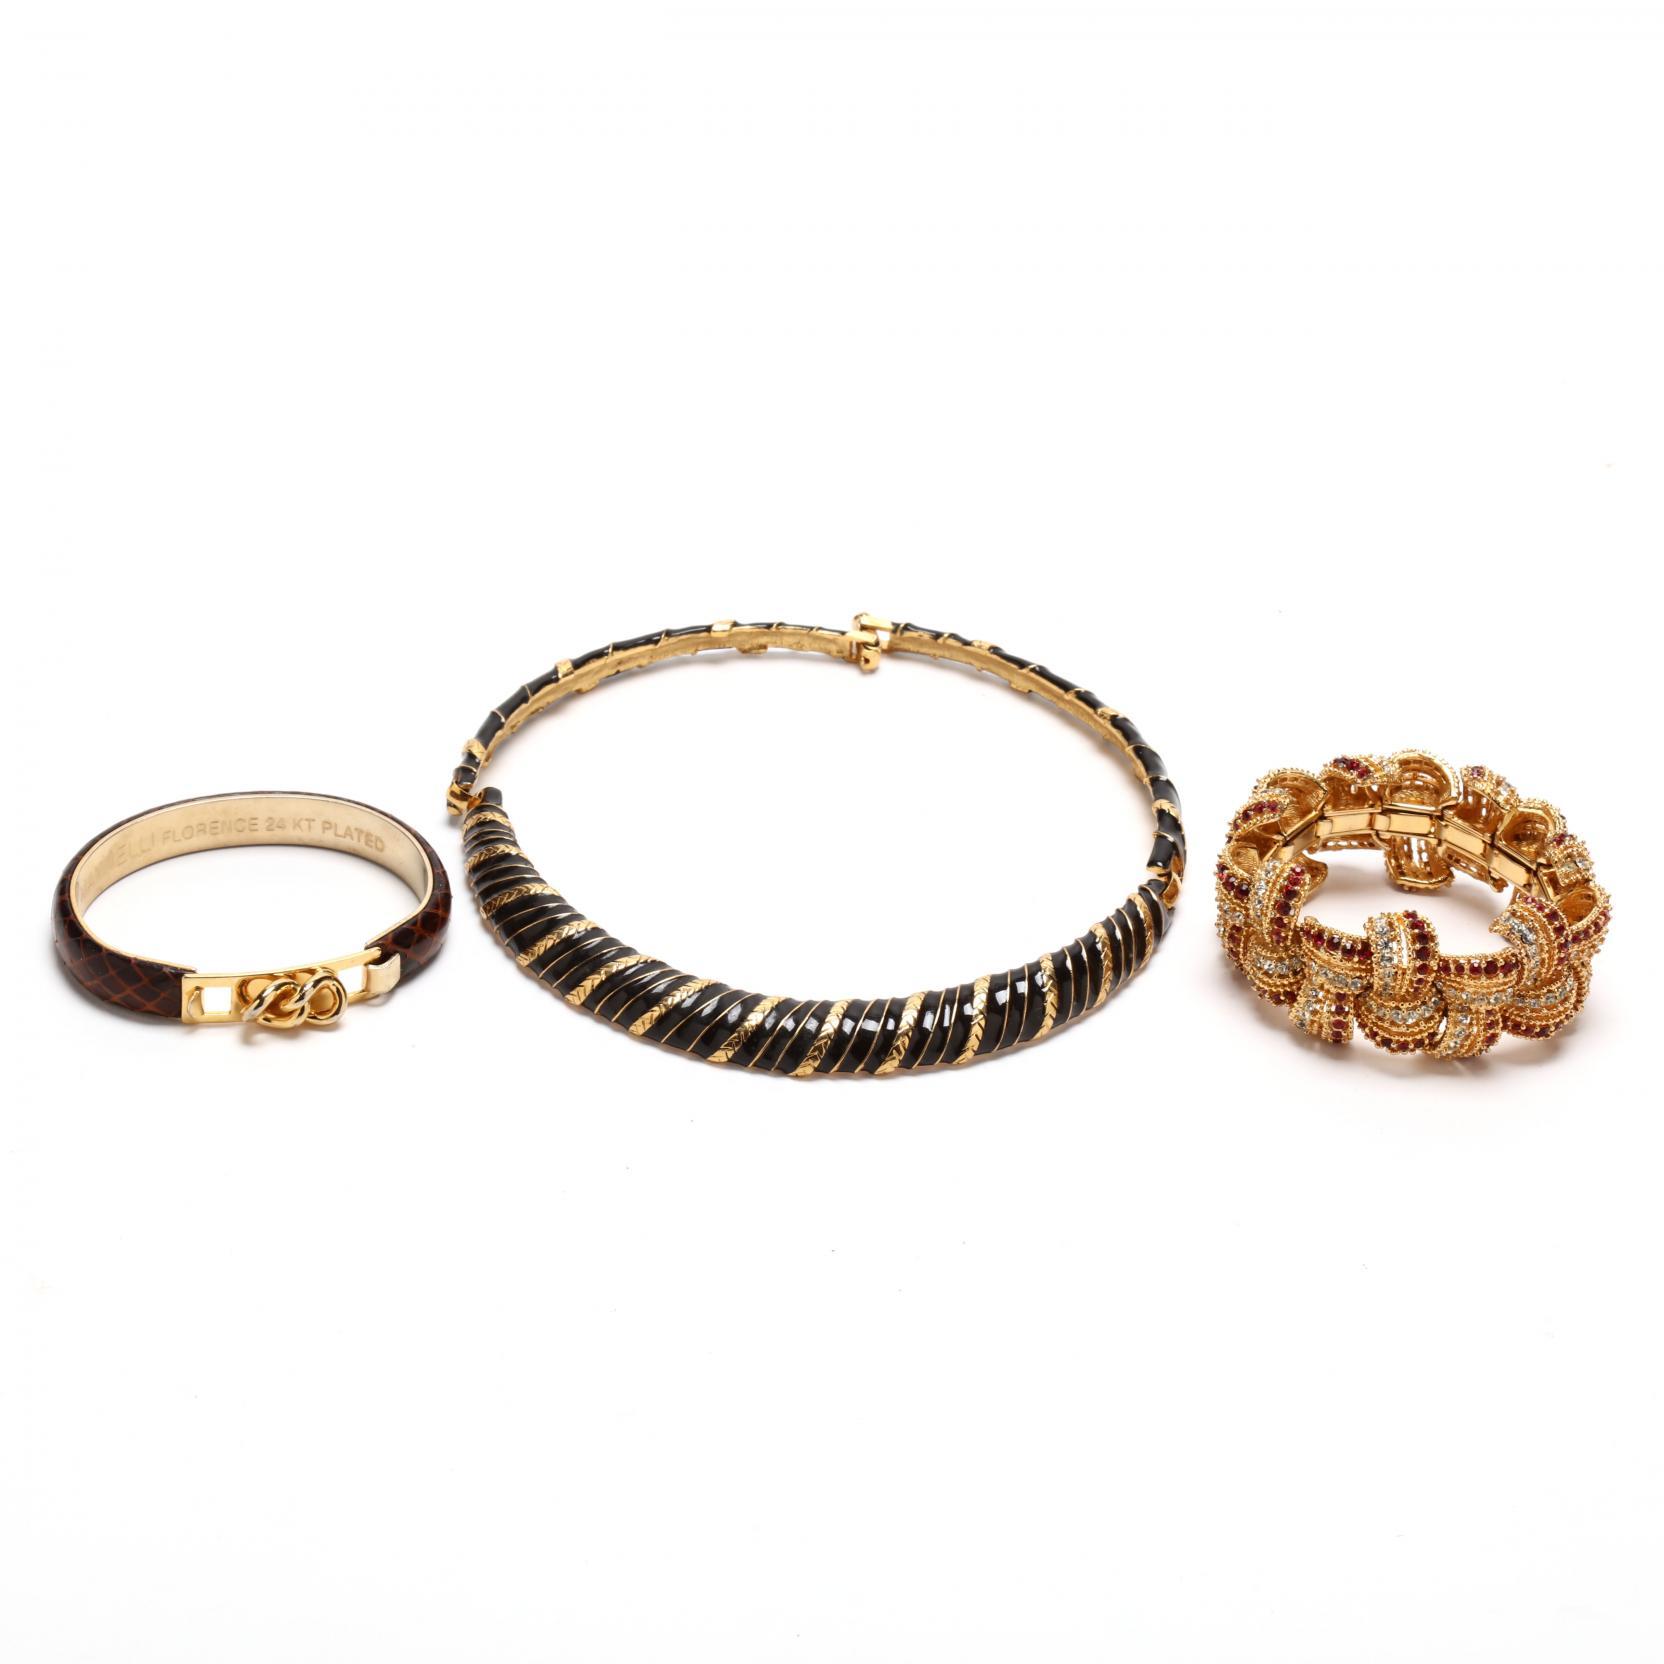 three-designer-costume-jewelry-pieces-signed